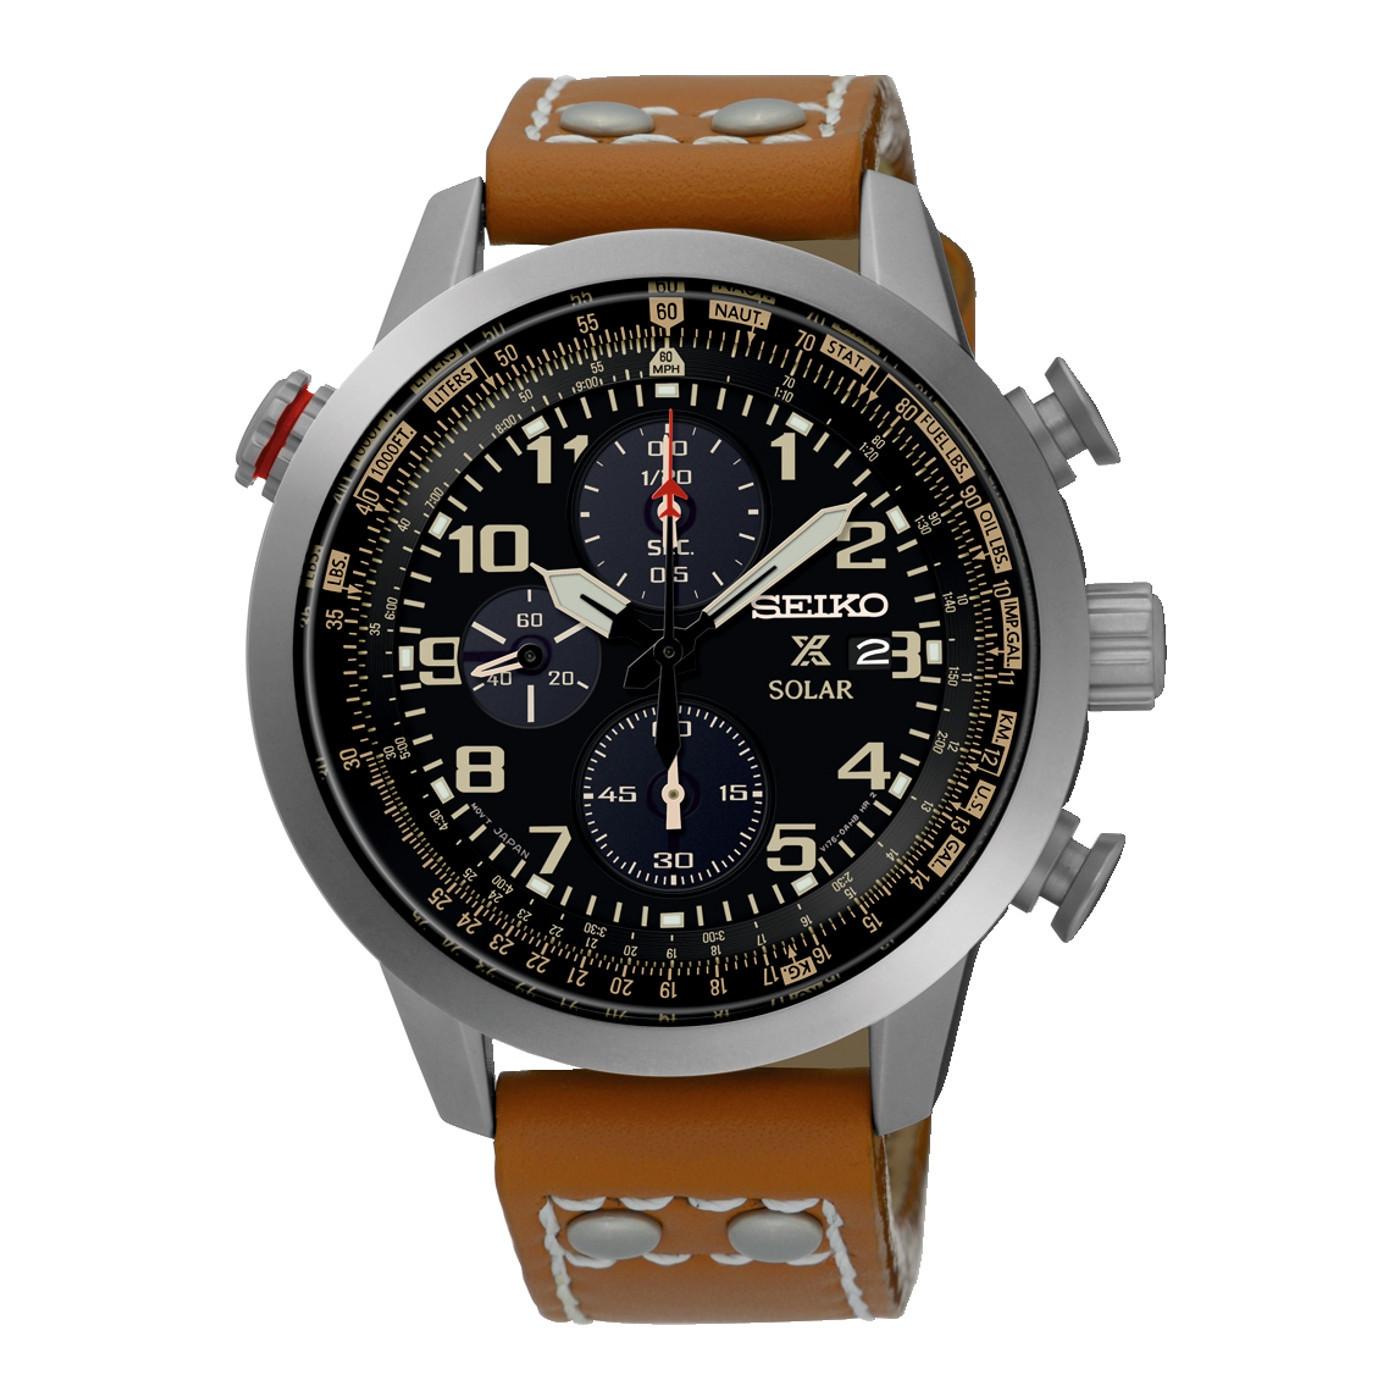 Seiko Prospex Solar Chronograph horloge SSC421P1